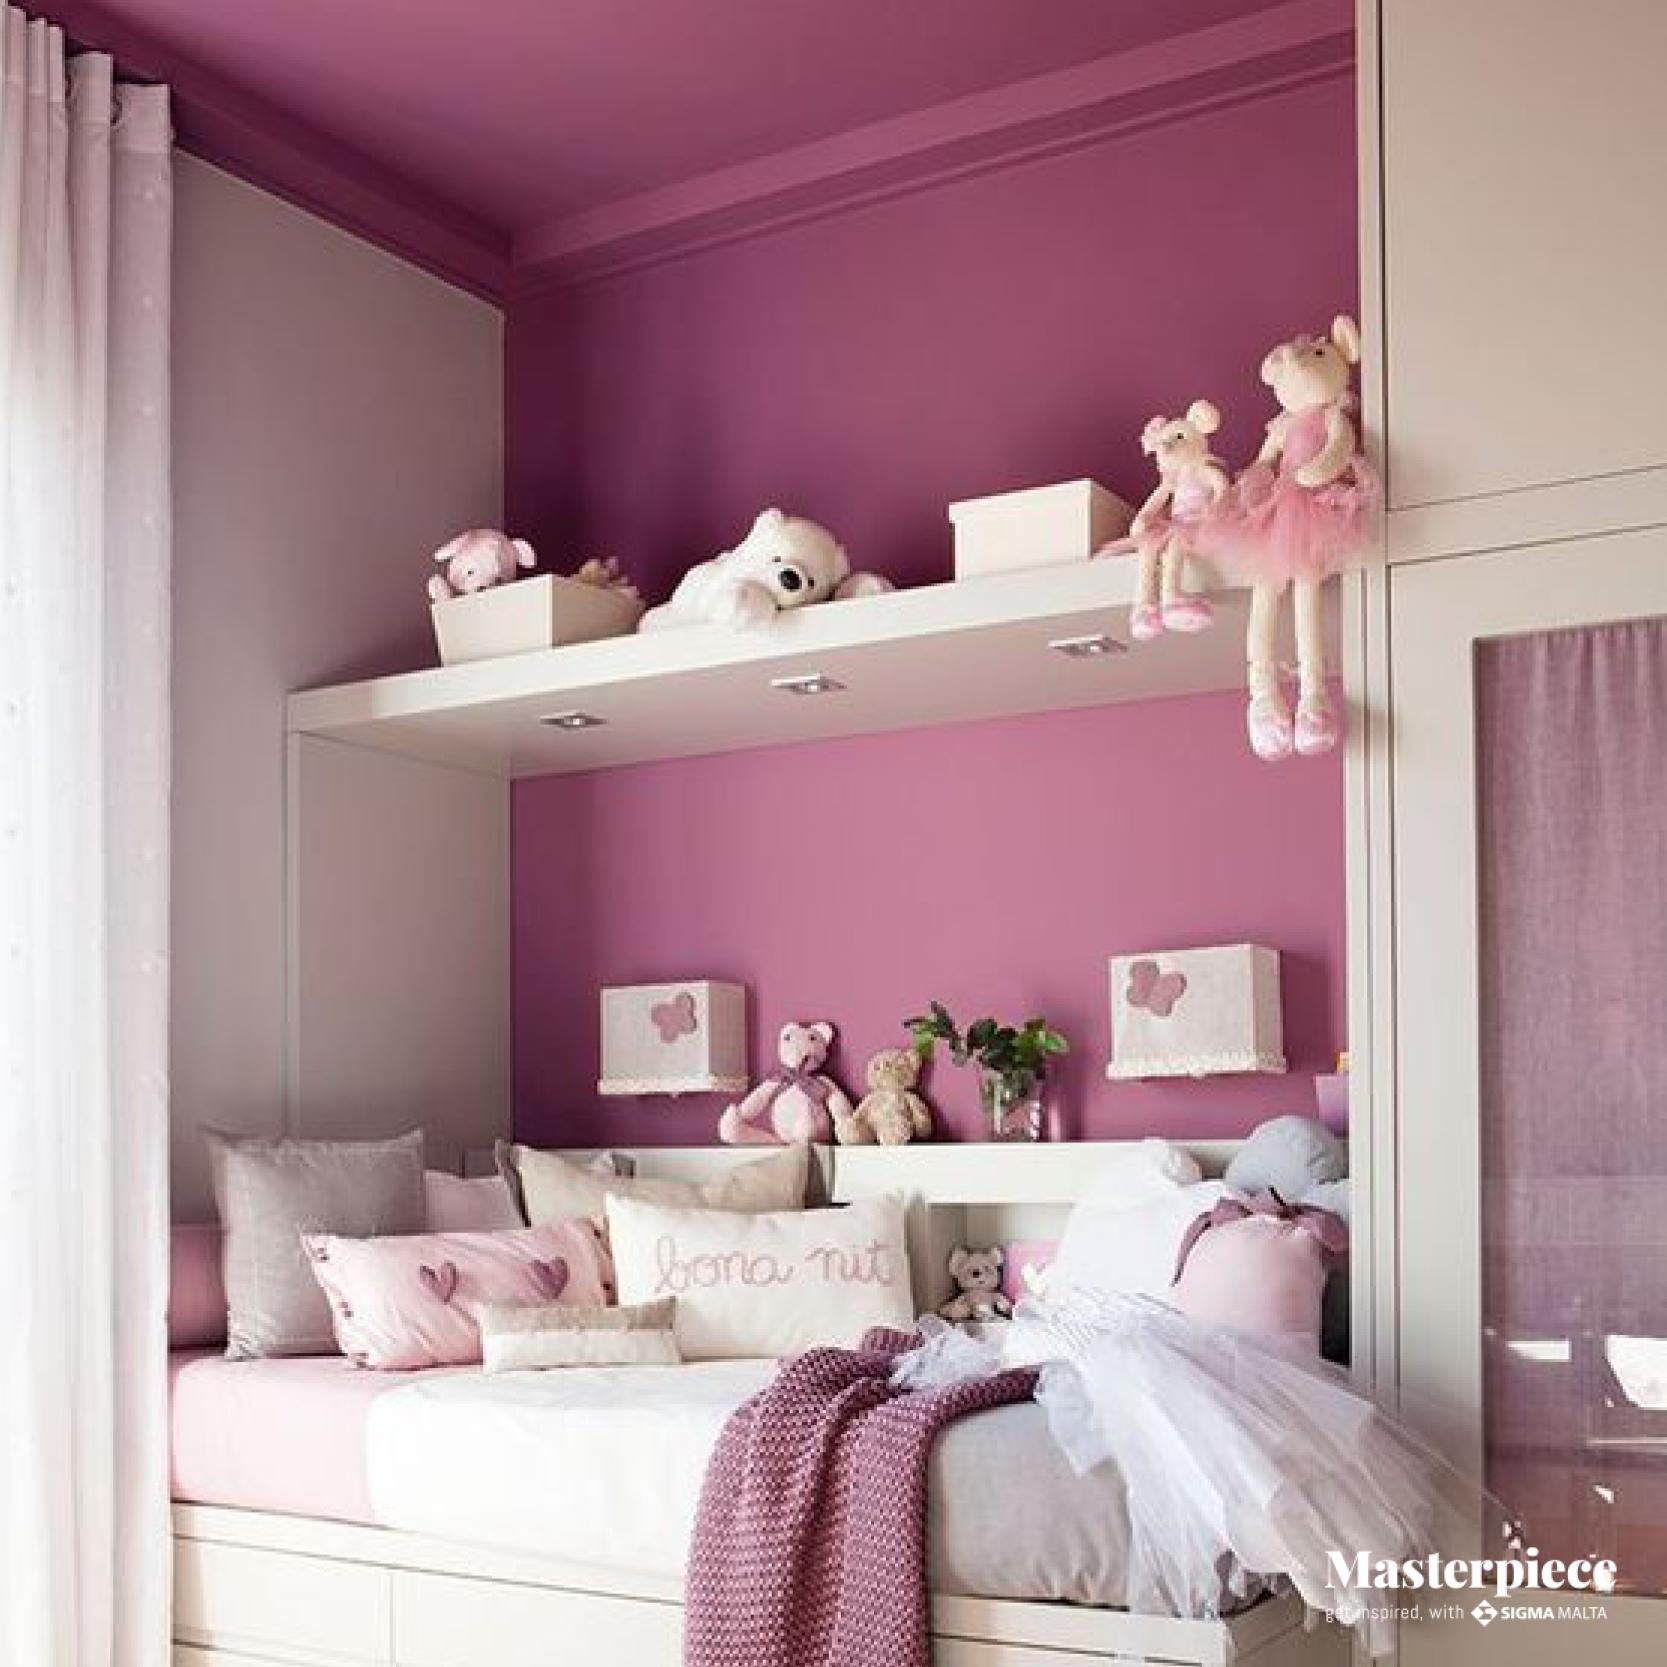 Warm pink tones </br><span> accompany child's dreams </span>